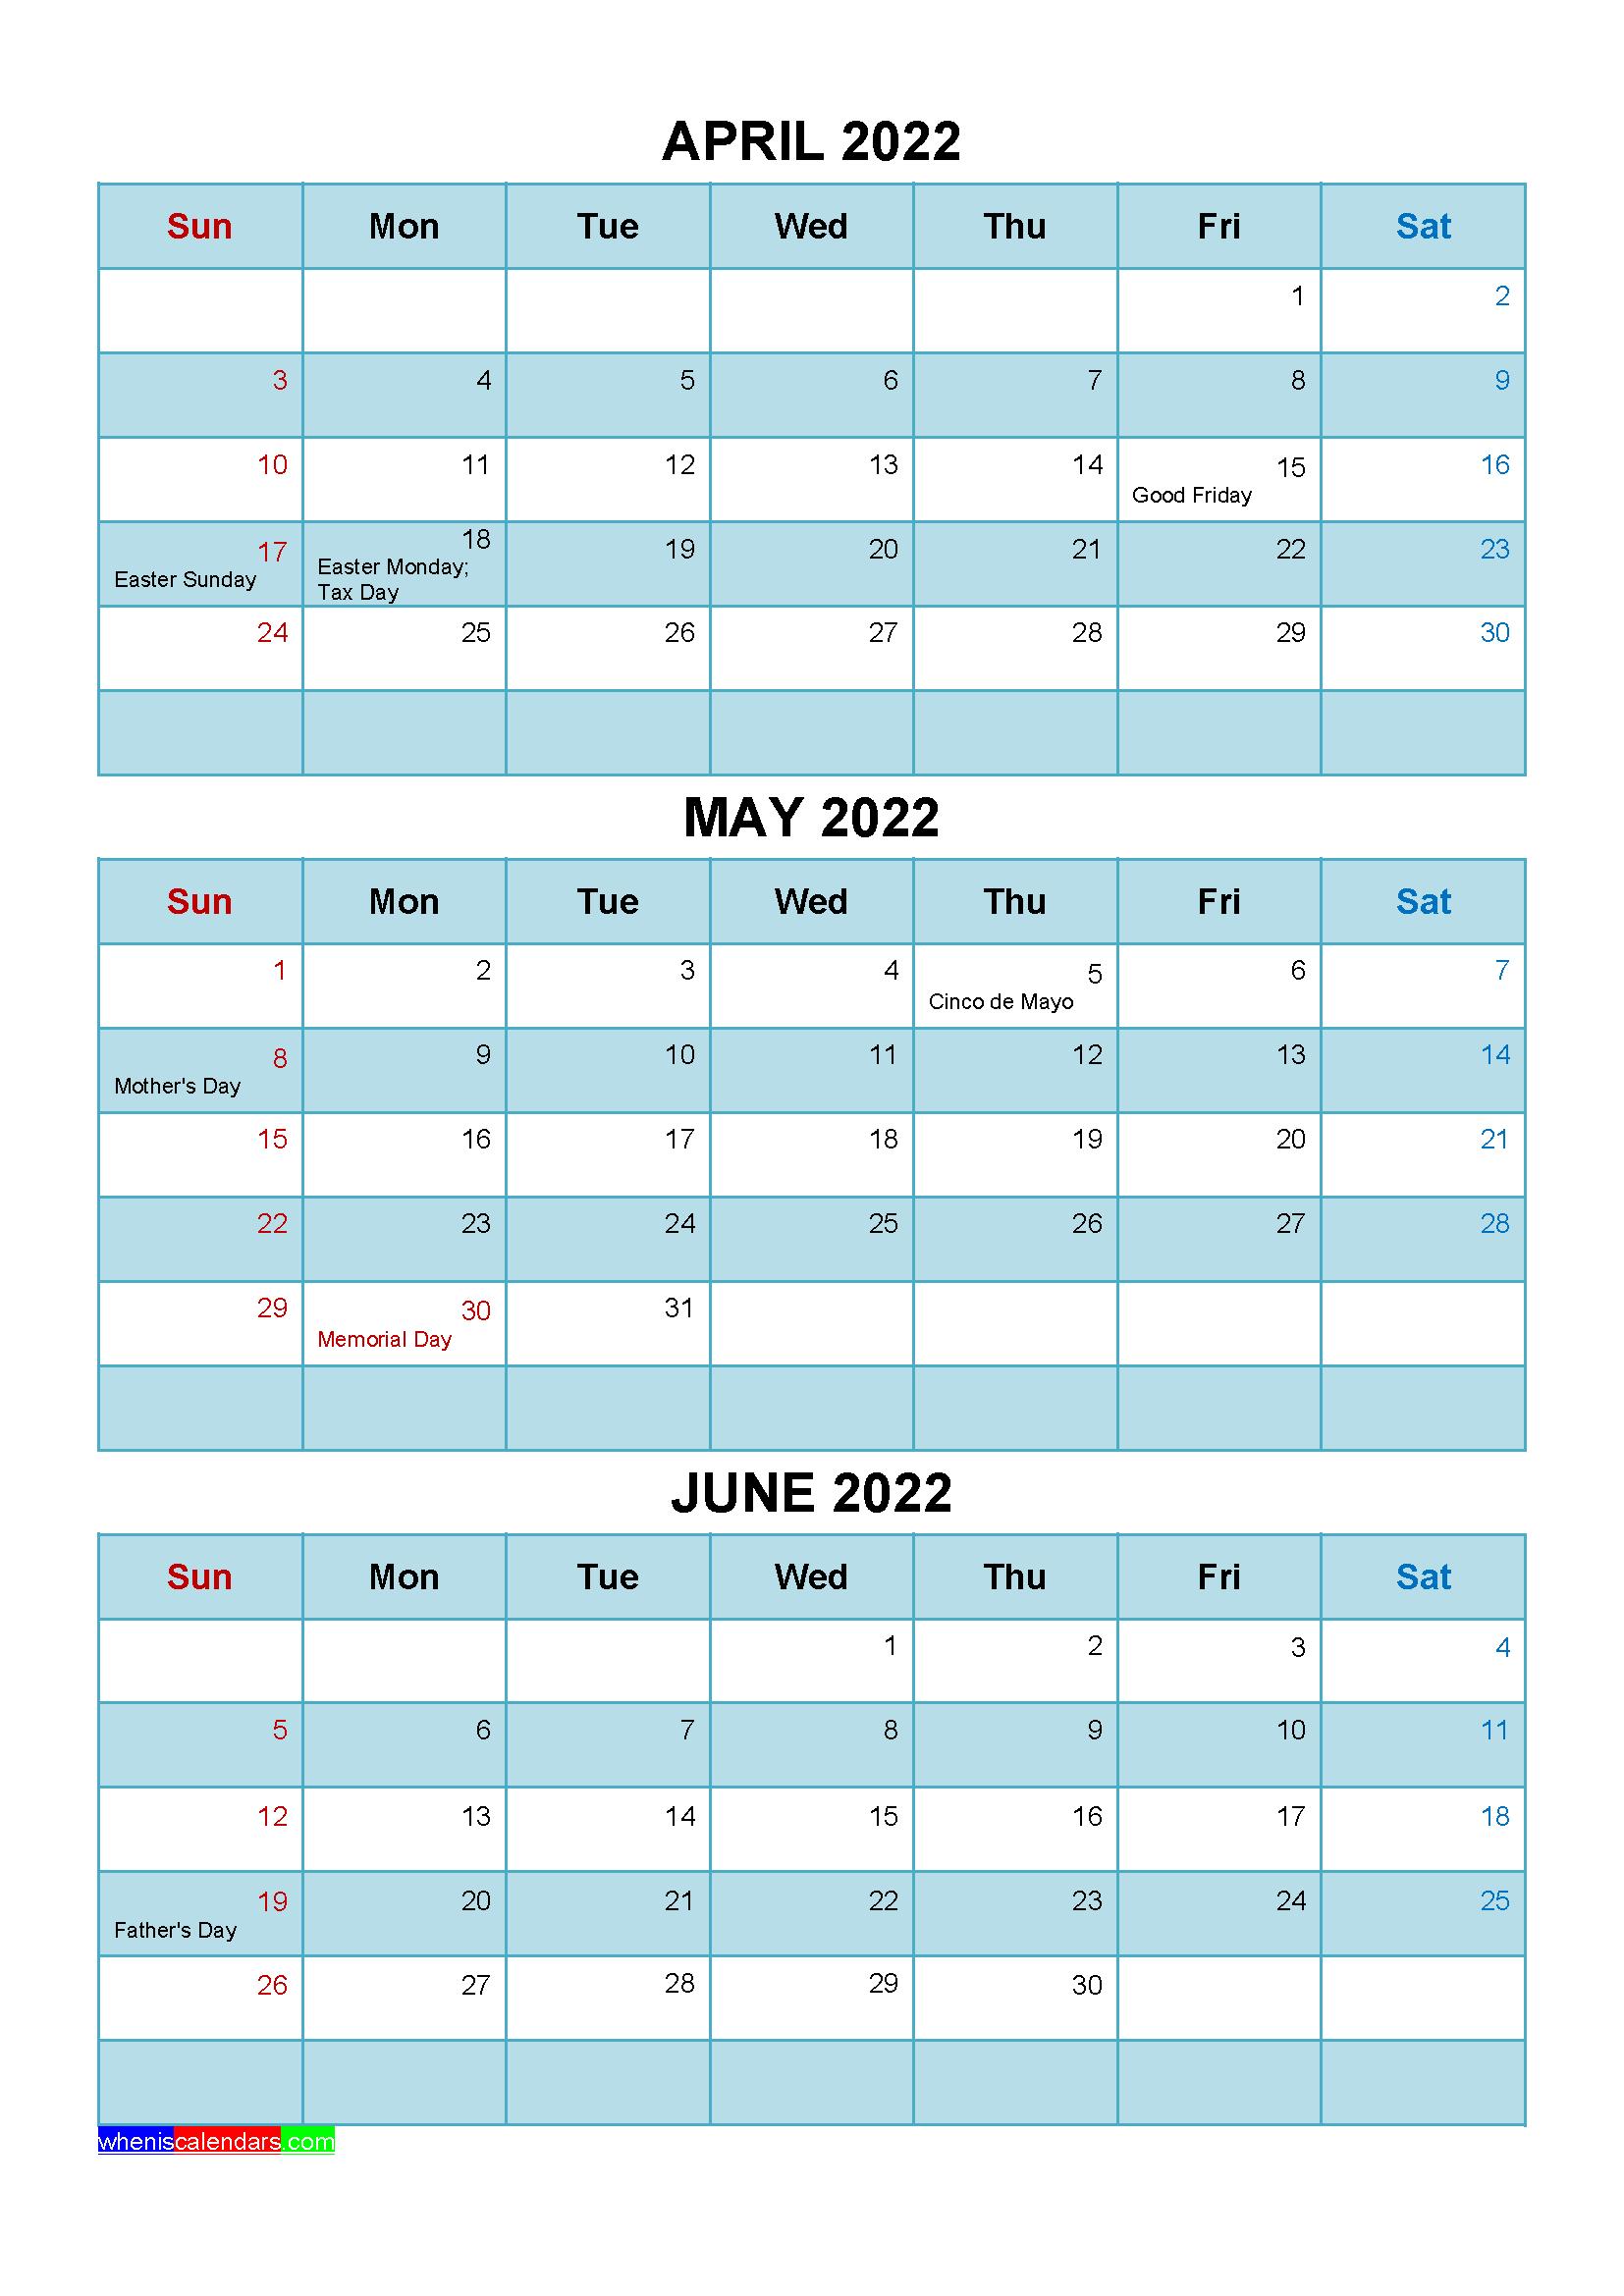 May June 2022 Calendar.Free April May June 2022 Calendar With Holidays Four Quarters Calendar Printables Quarterly Calendar Calendar Template